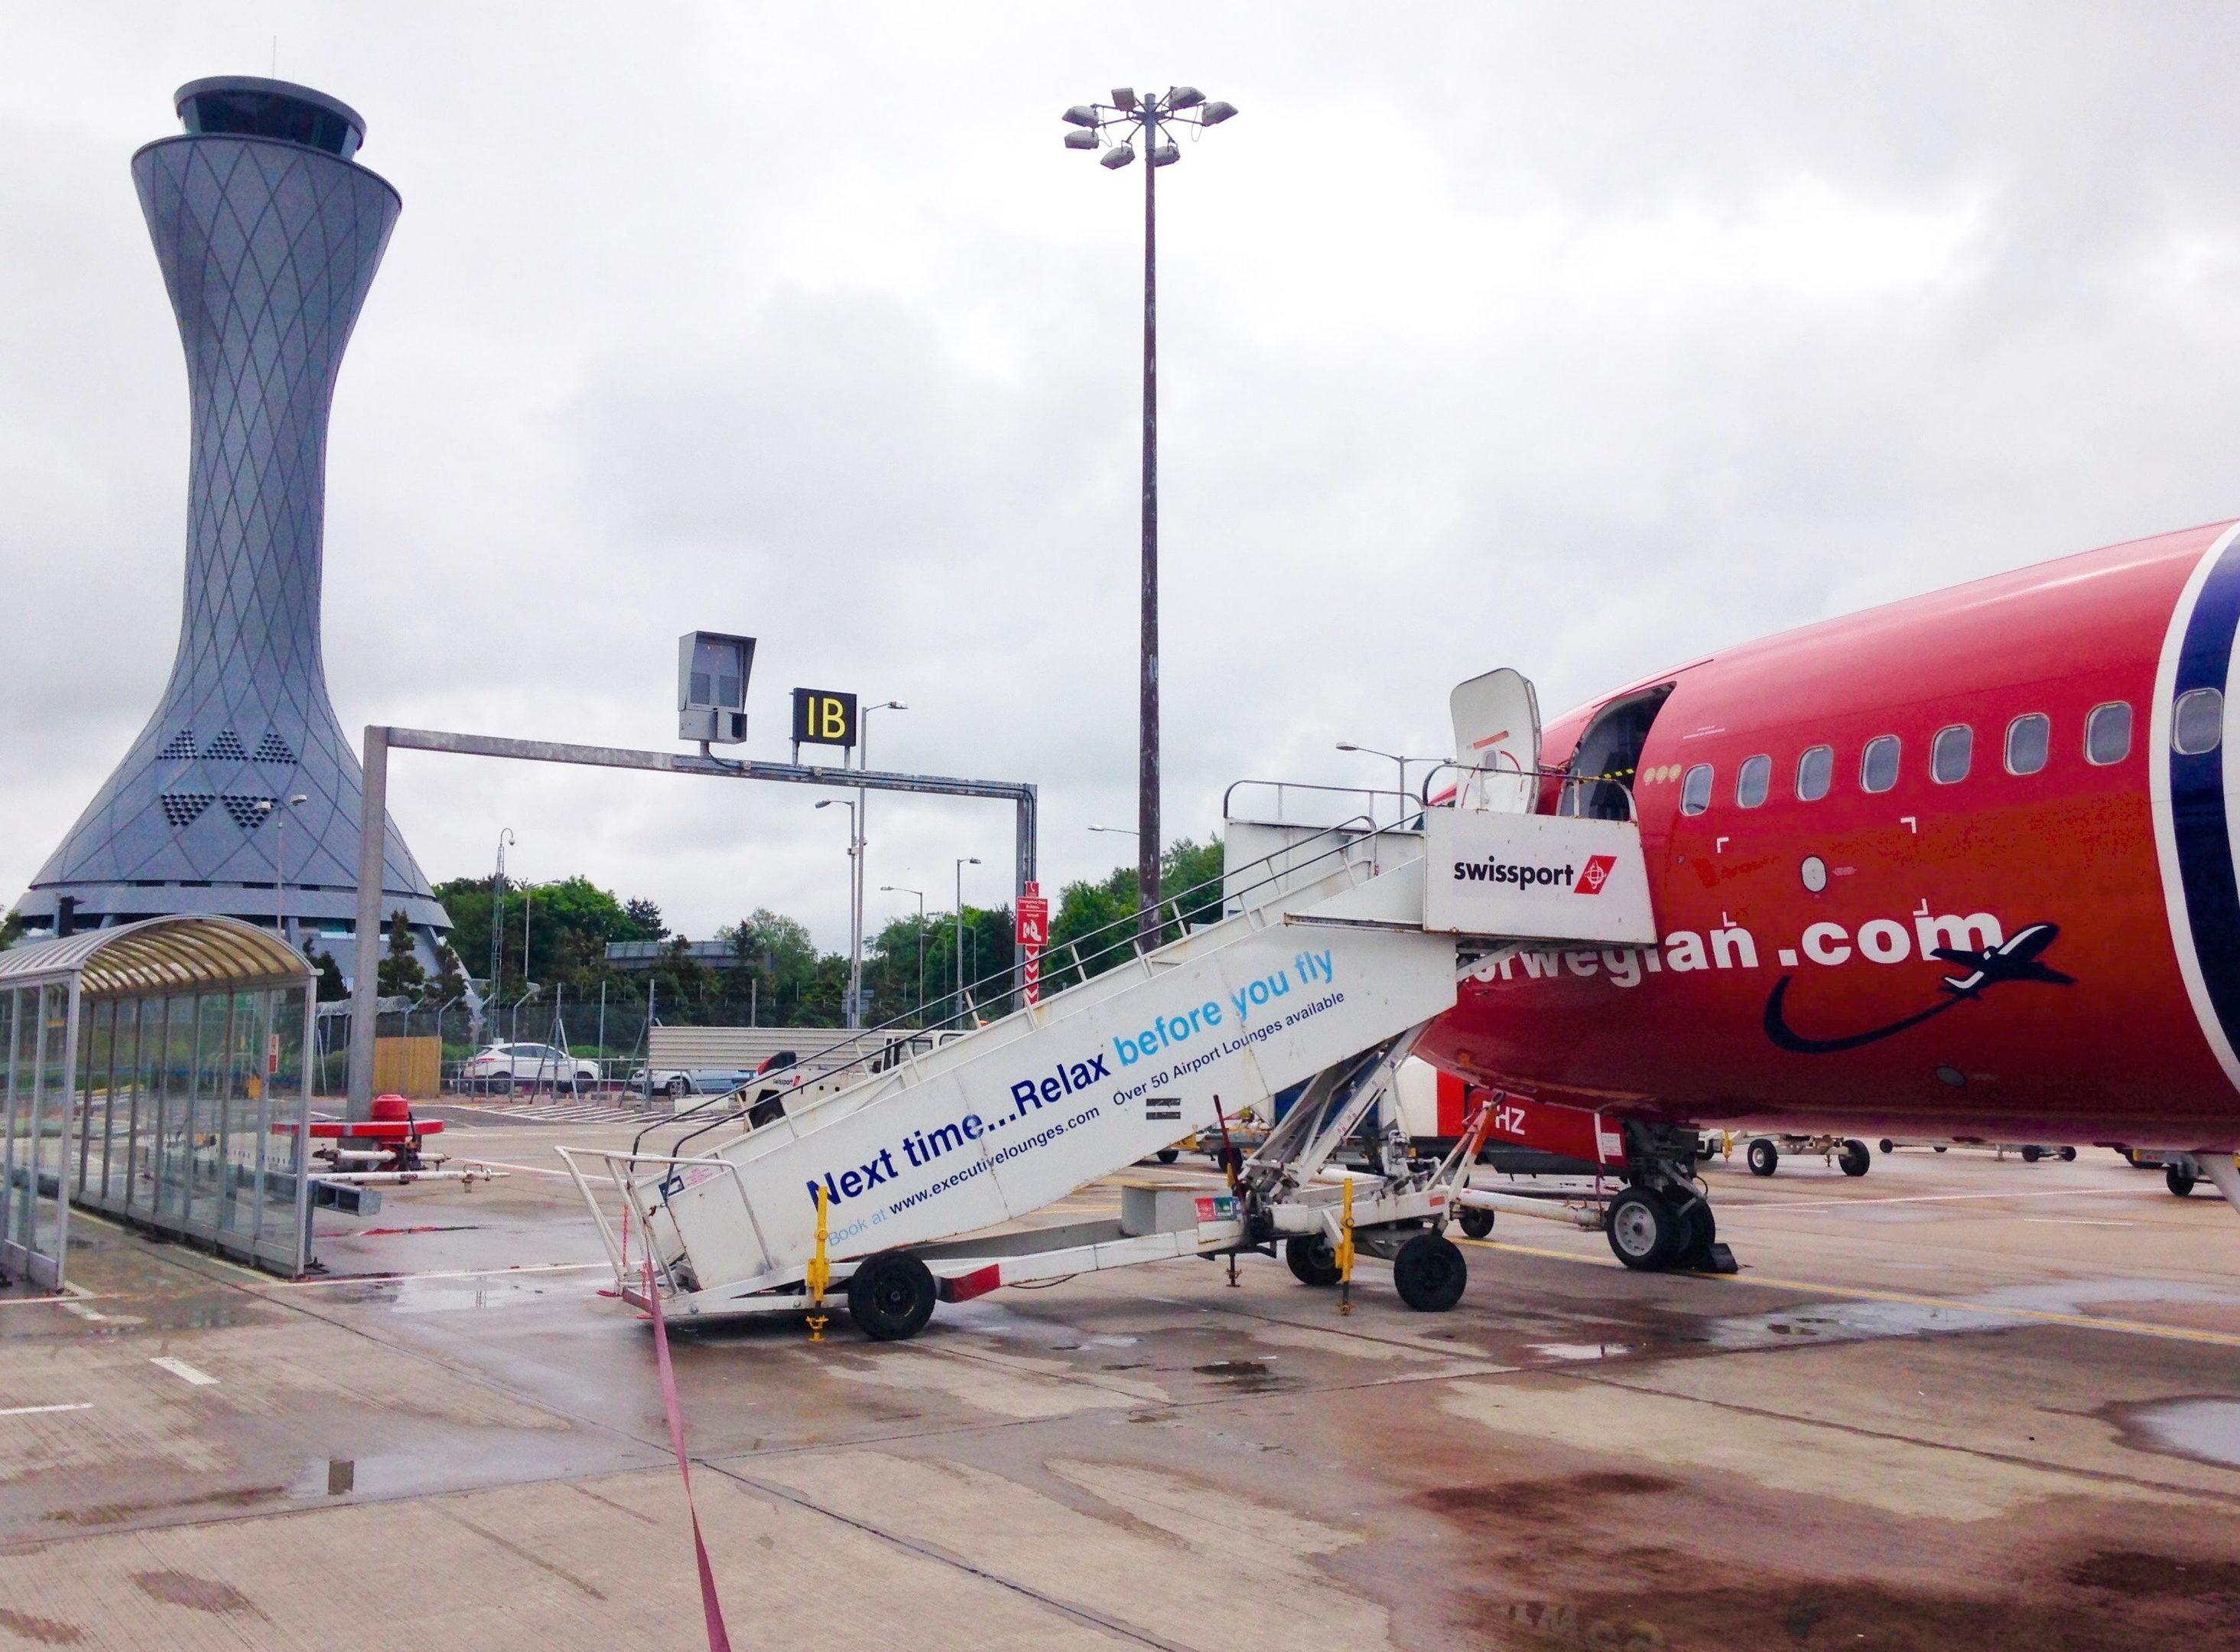 A Norwegian aircraft at Edinburgh Airport